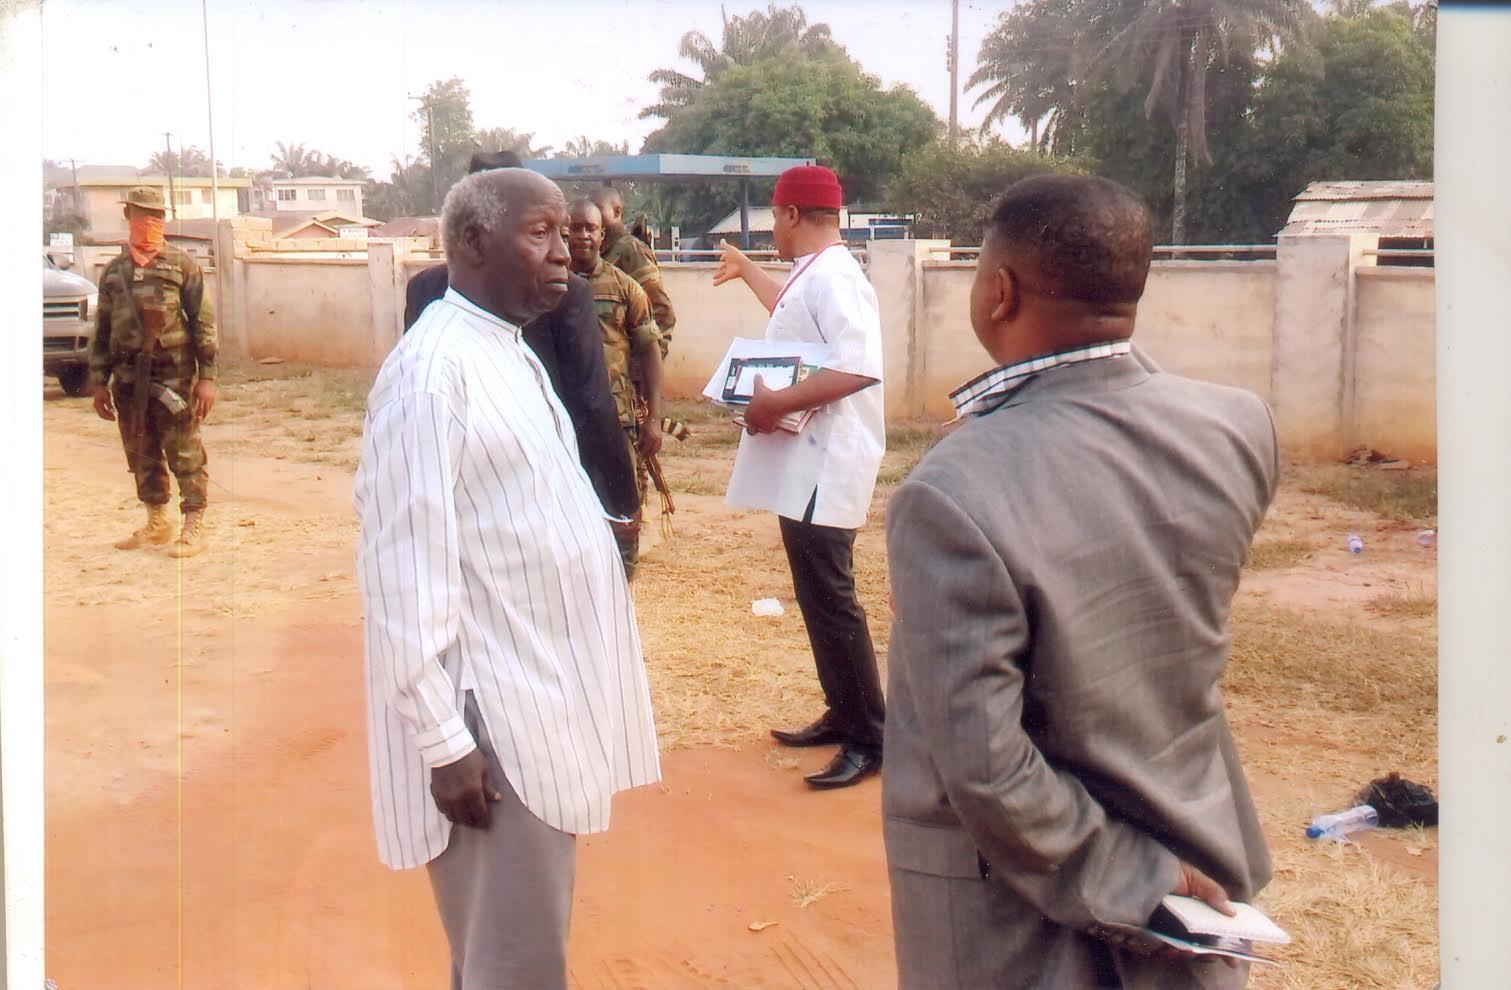 Photo:( L-R Dr Dozie Ikedife, (Vice Chairman IPOB): Air Commodore Benson Omoyinbo(leader of Military Delegation), Barrister Okpalaukwu Okpalaezeukwu(Coordinator Igbo-Ohanaeze Integrity Groups) at the background )